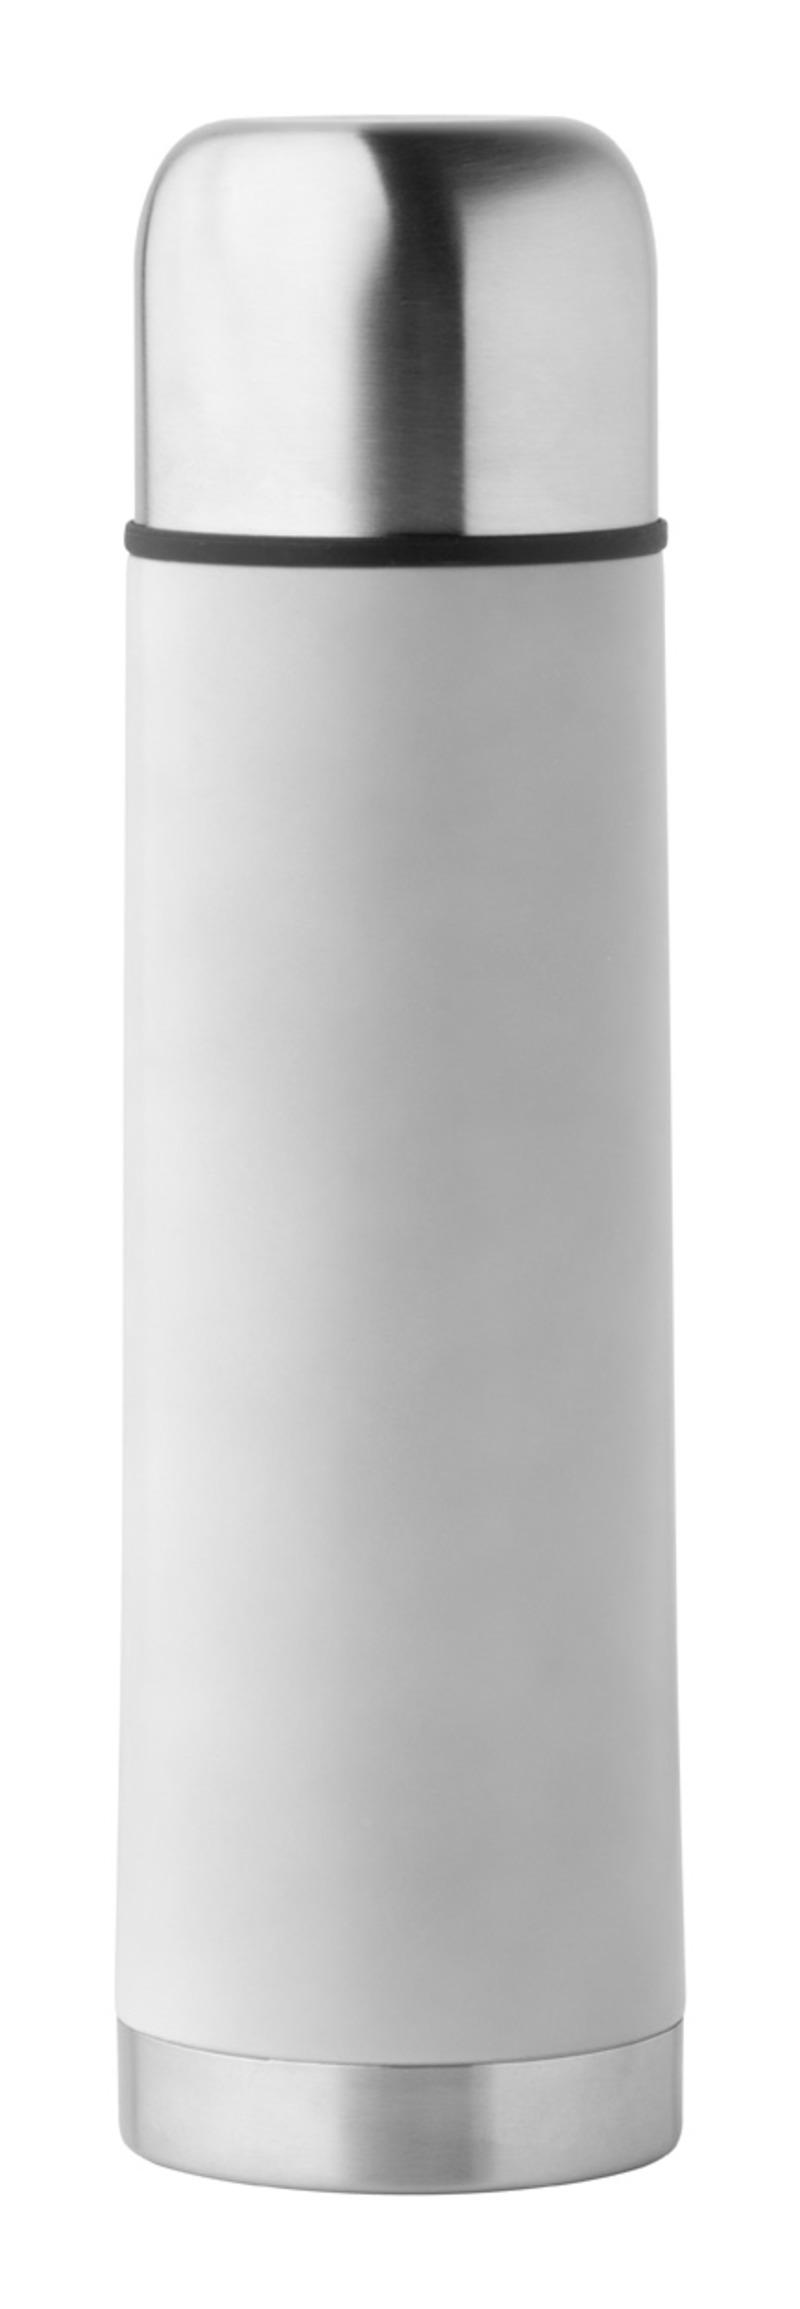 Geisha vacuum flask